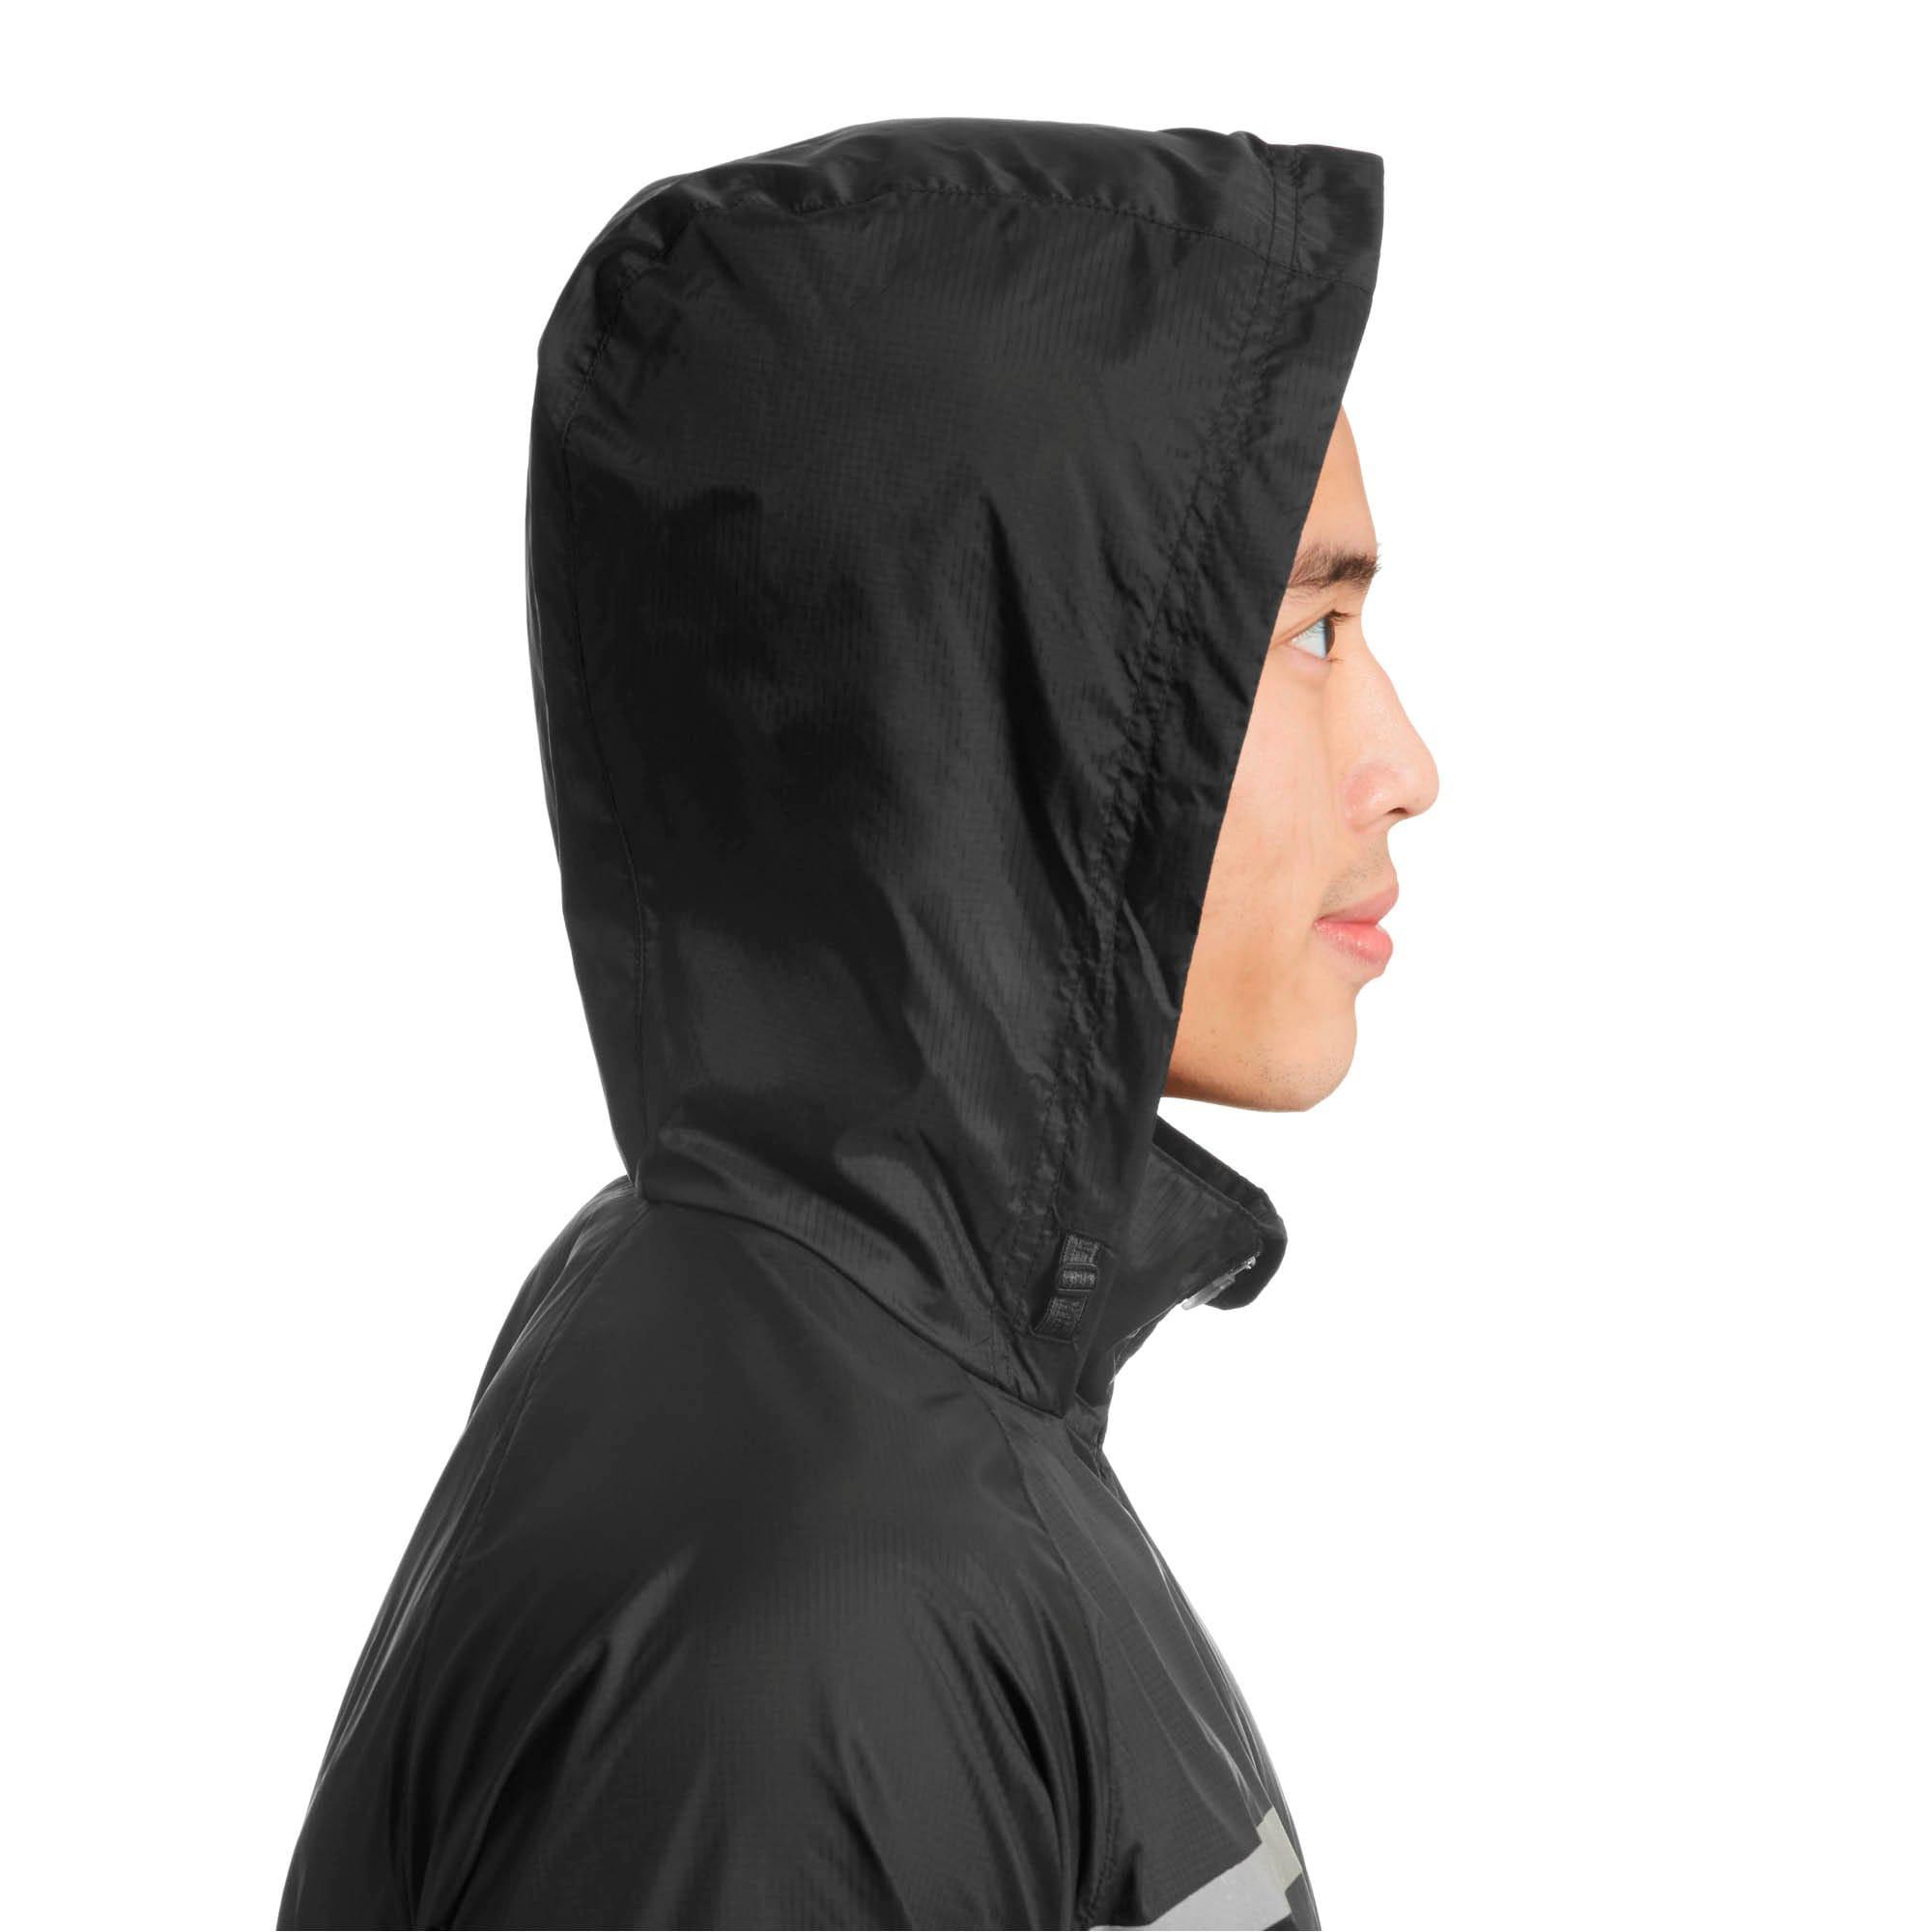 Thumbnail 4 of Lightweight Hooded Men's Jacket, Puma Black, medium